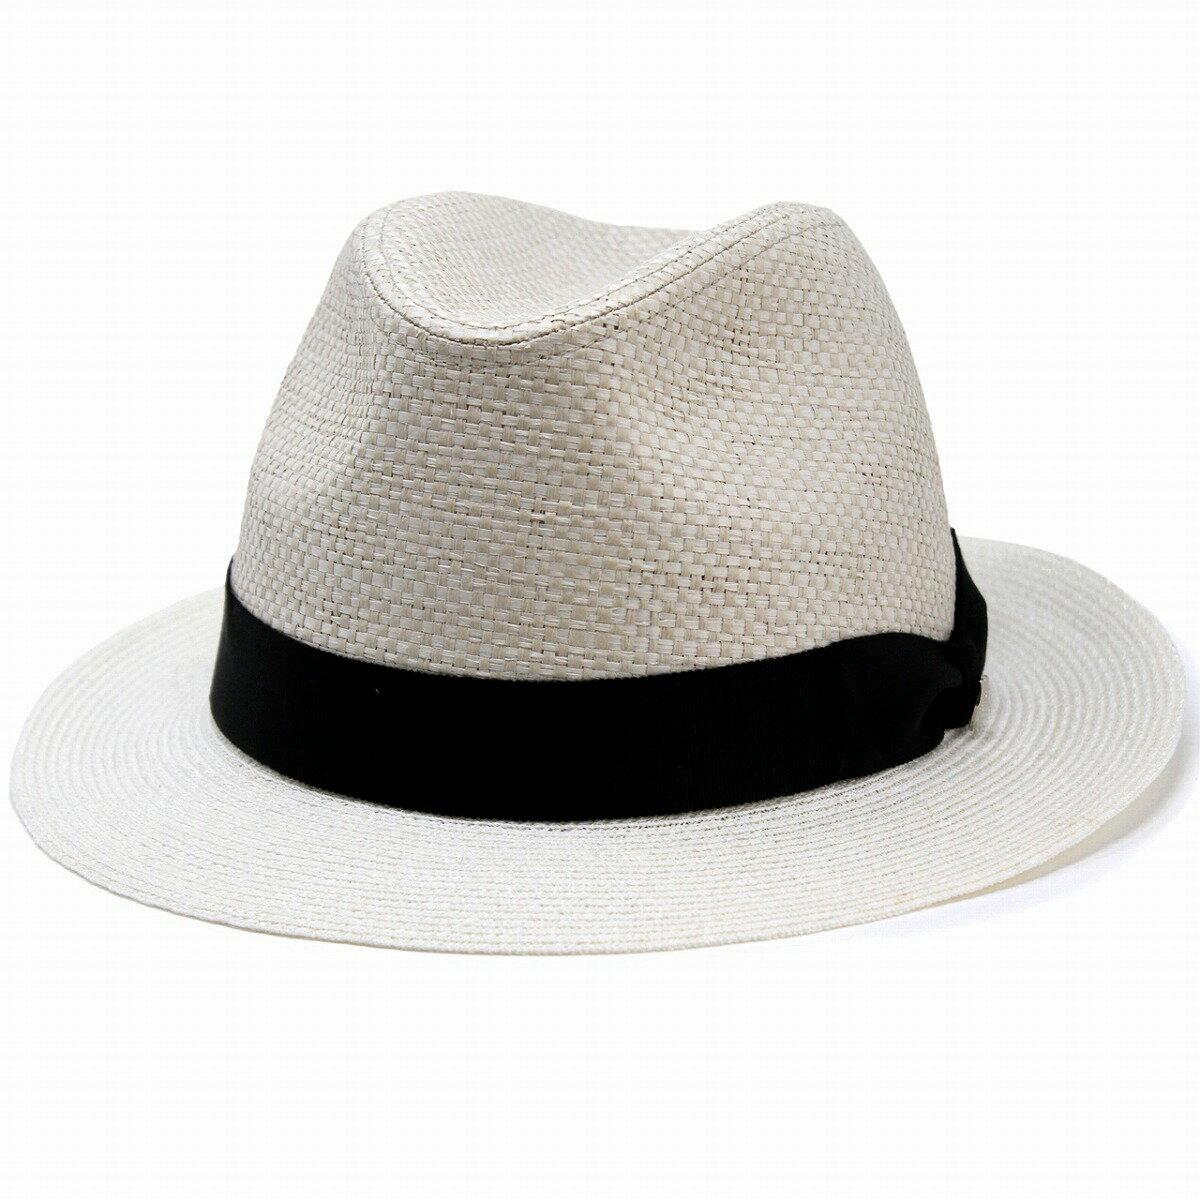 fc09dd0d2540c2 daks 帽子 メンズ ダックス ストローハット 無地 STETSON 中折れ ...